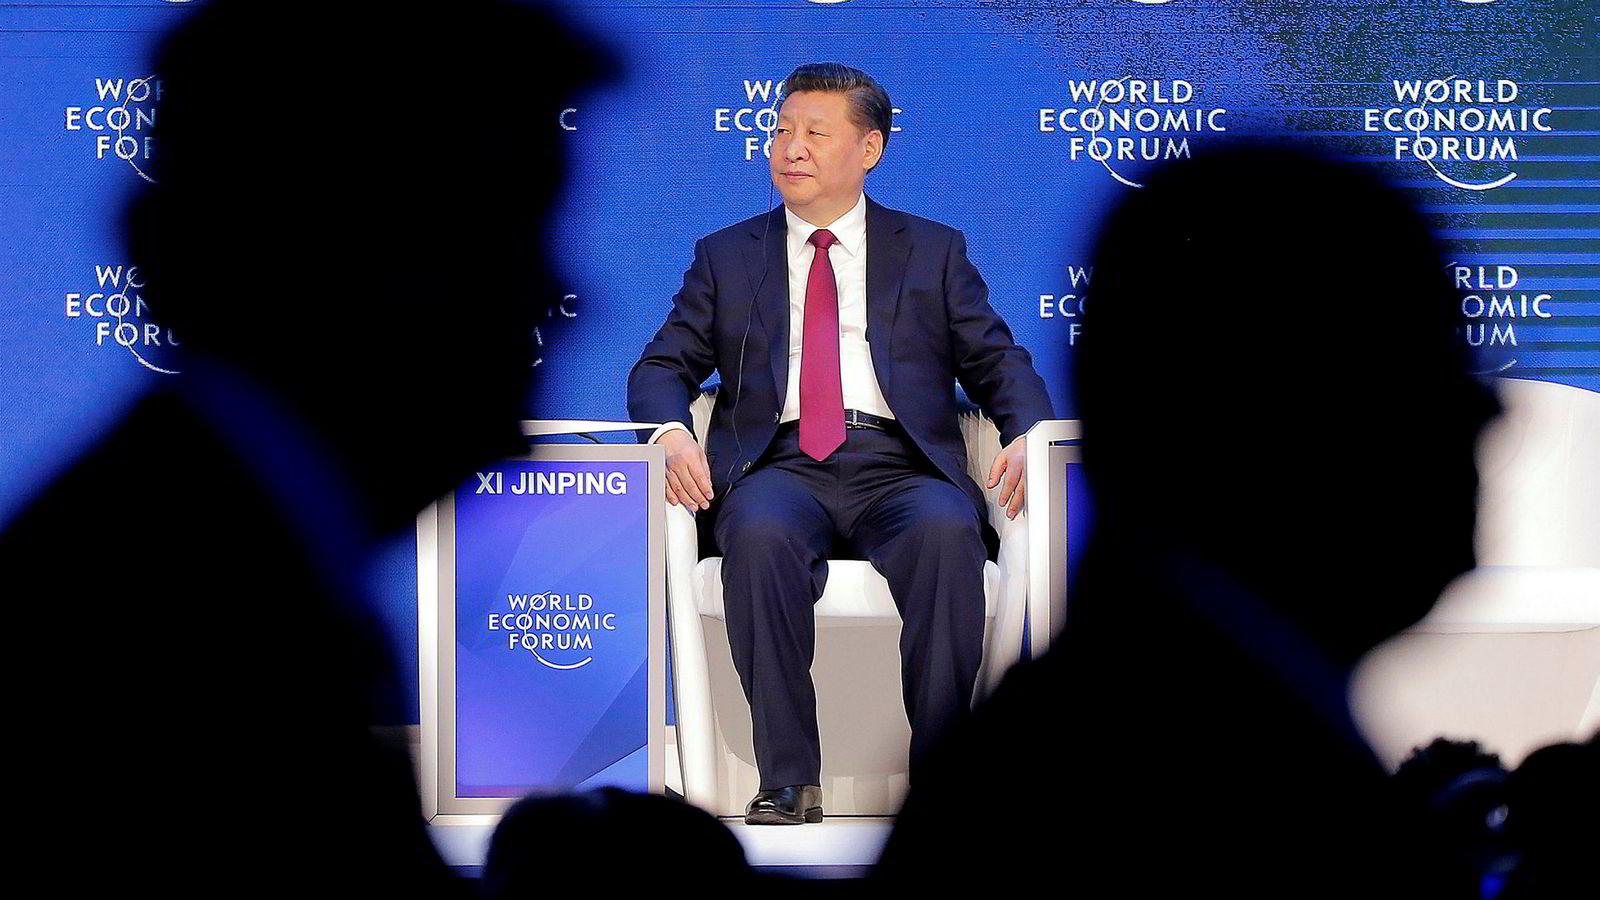 I globalismens katedral – kringsatt av kapitalister – holdt Xi Jinping frem Kina som frihandelens, globaliseringens sanne forsvarer – til stormende applaus, skriver Asle Toje. Her sitter Kinas president Xi Jinping på podiet under World Economic Forum i Davos, 17. januar 2017.